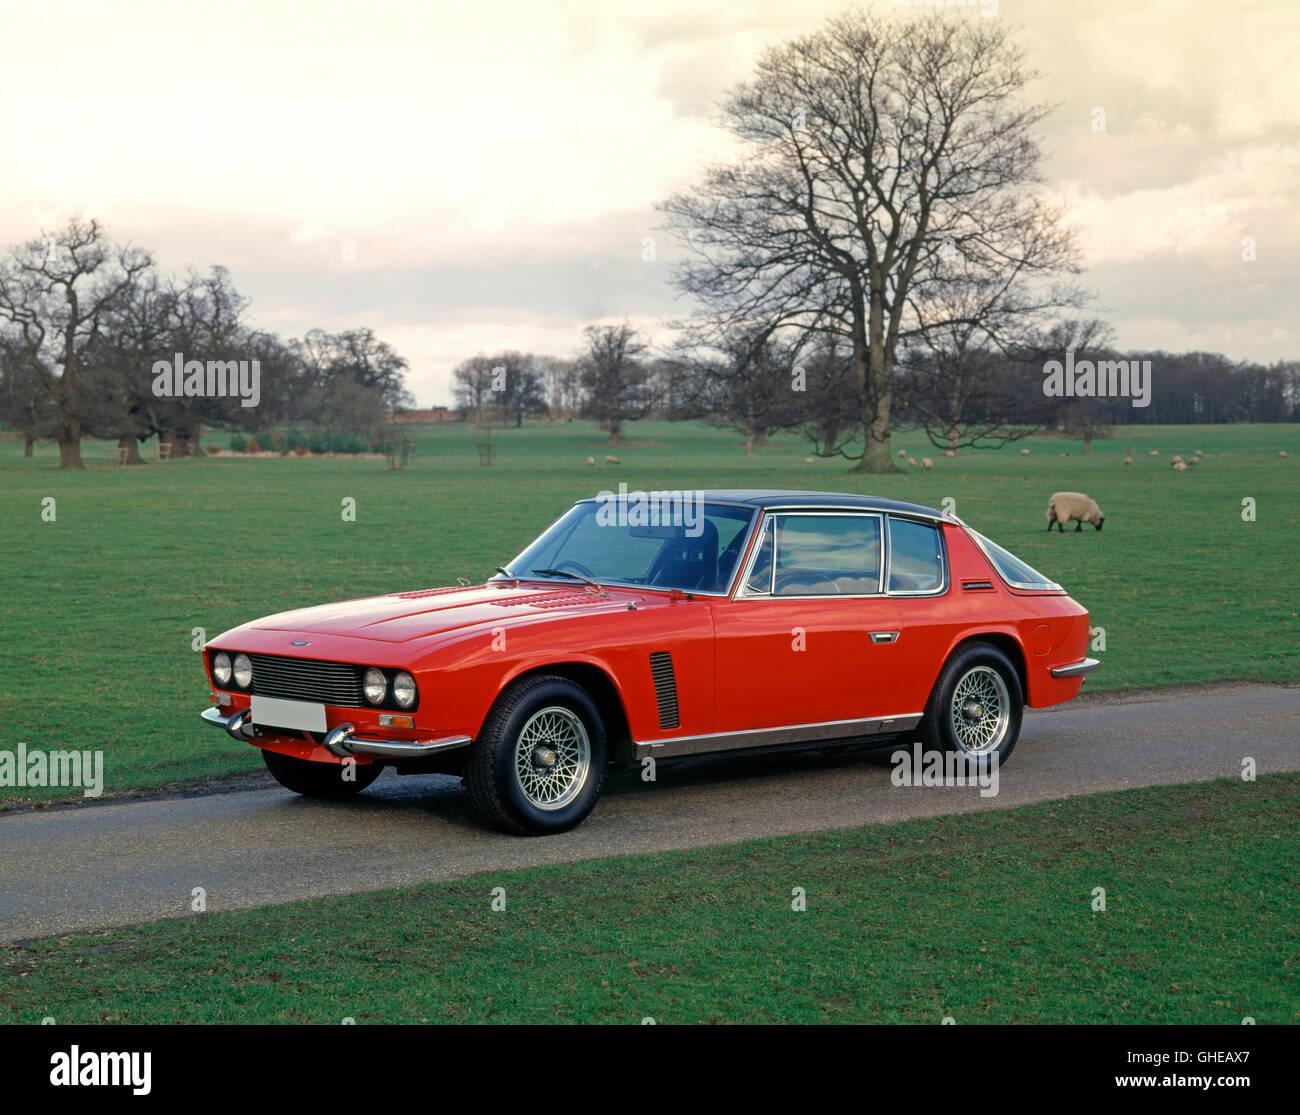 1968 Jensen Intereptor MkI Racing saloon 6 2 litre engine developing 450 bhp Country of origin United Kingdom - Stock Image